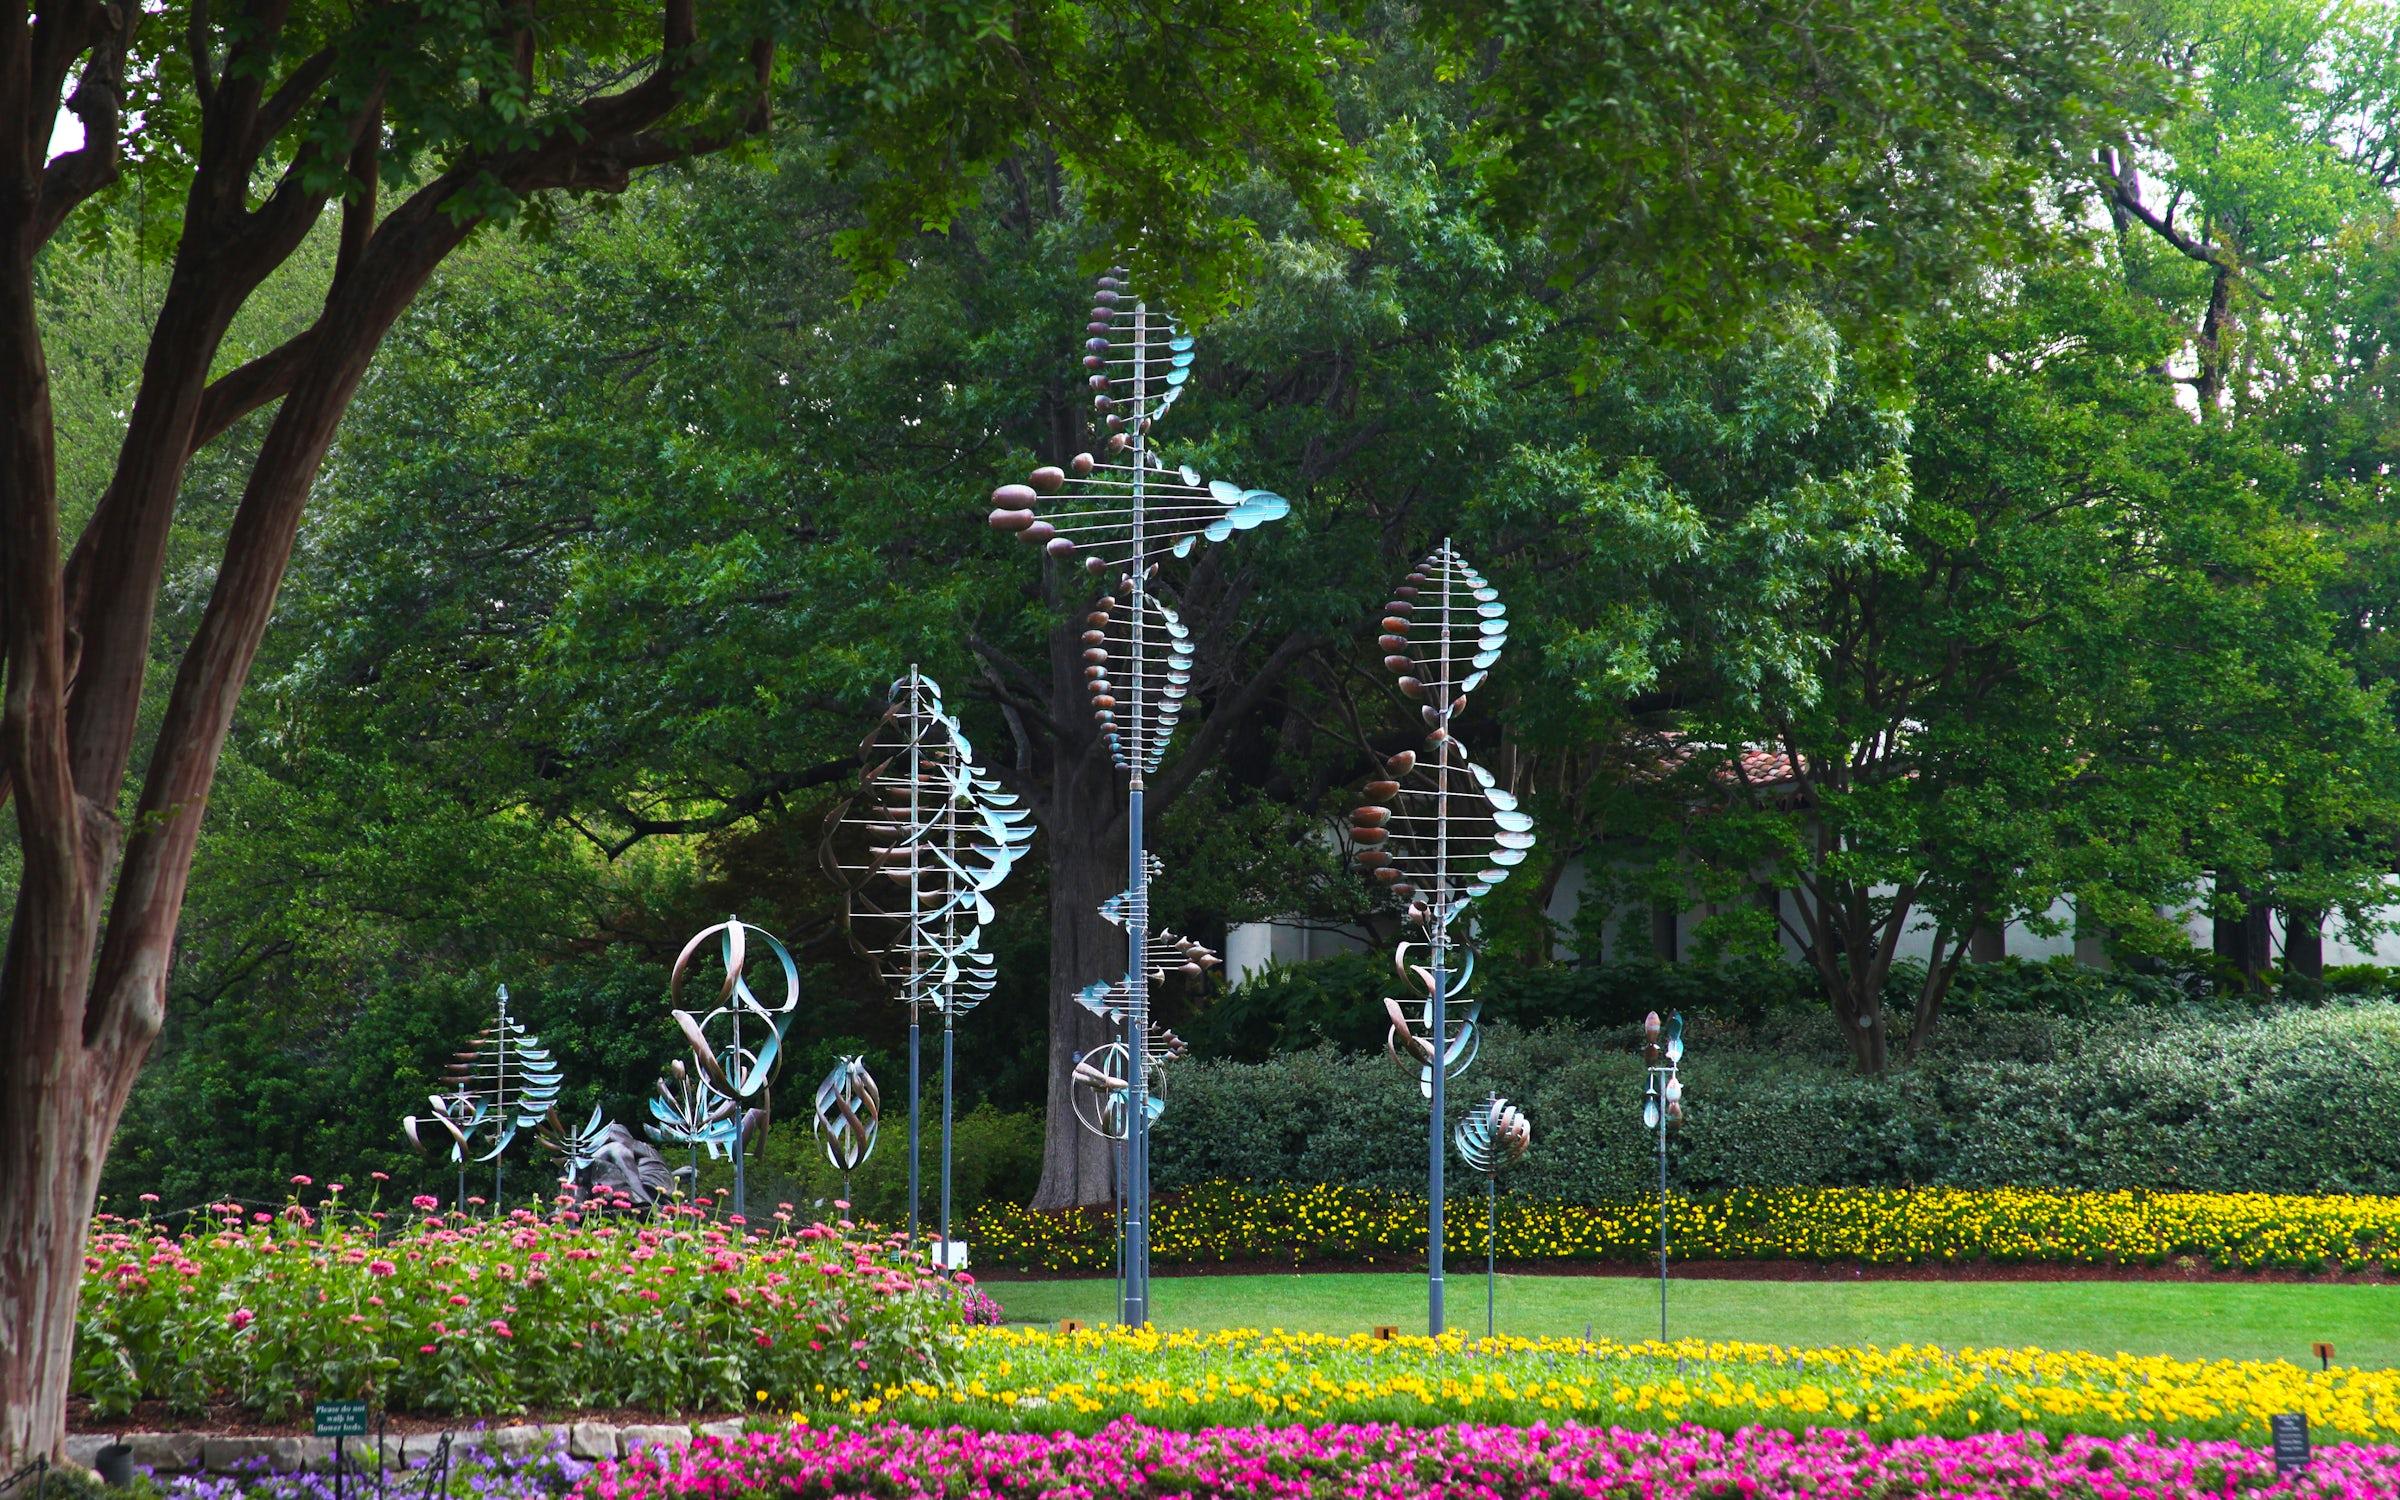 Dallas Arboretum and Botanical Garden in Beyond Dallas